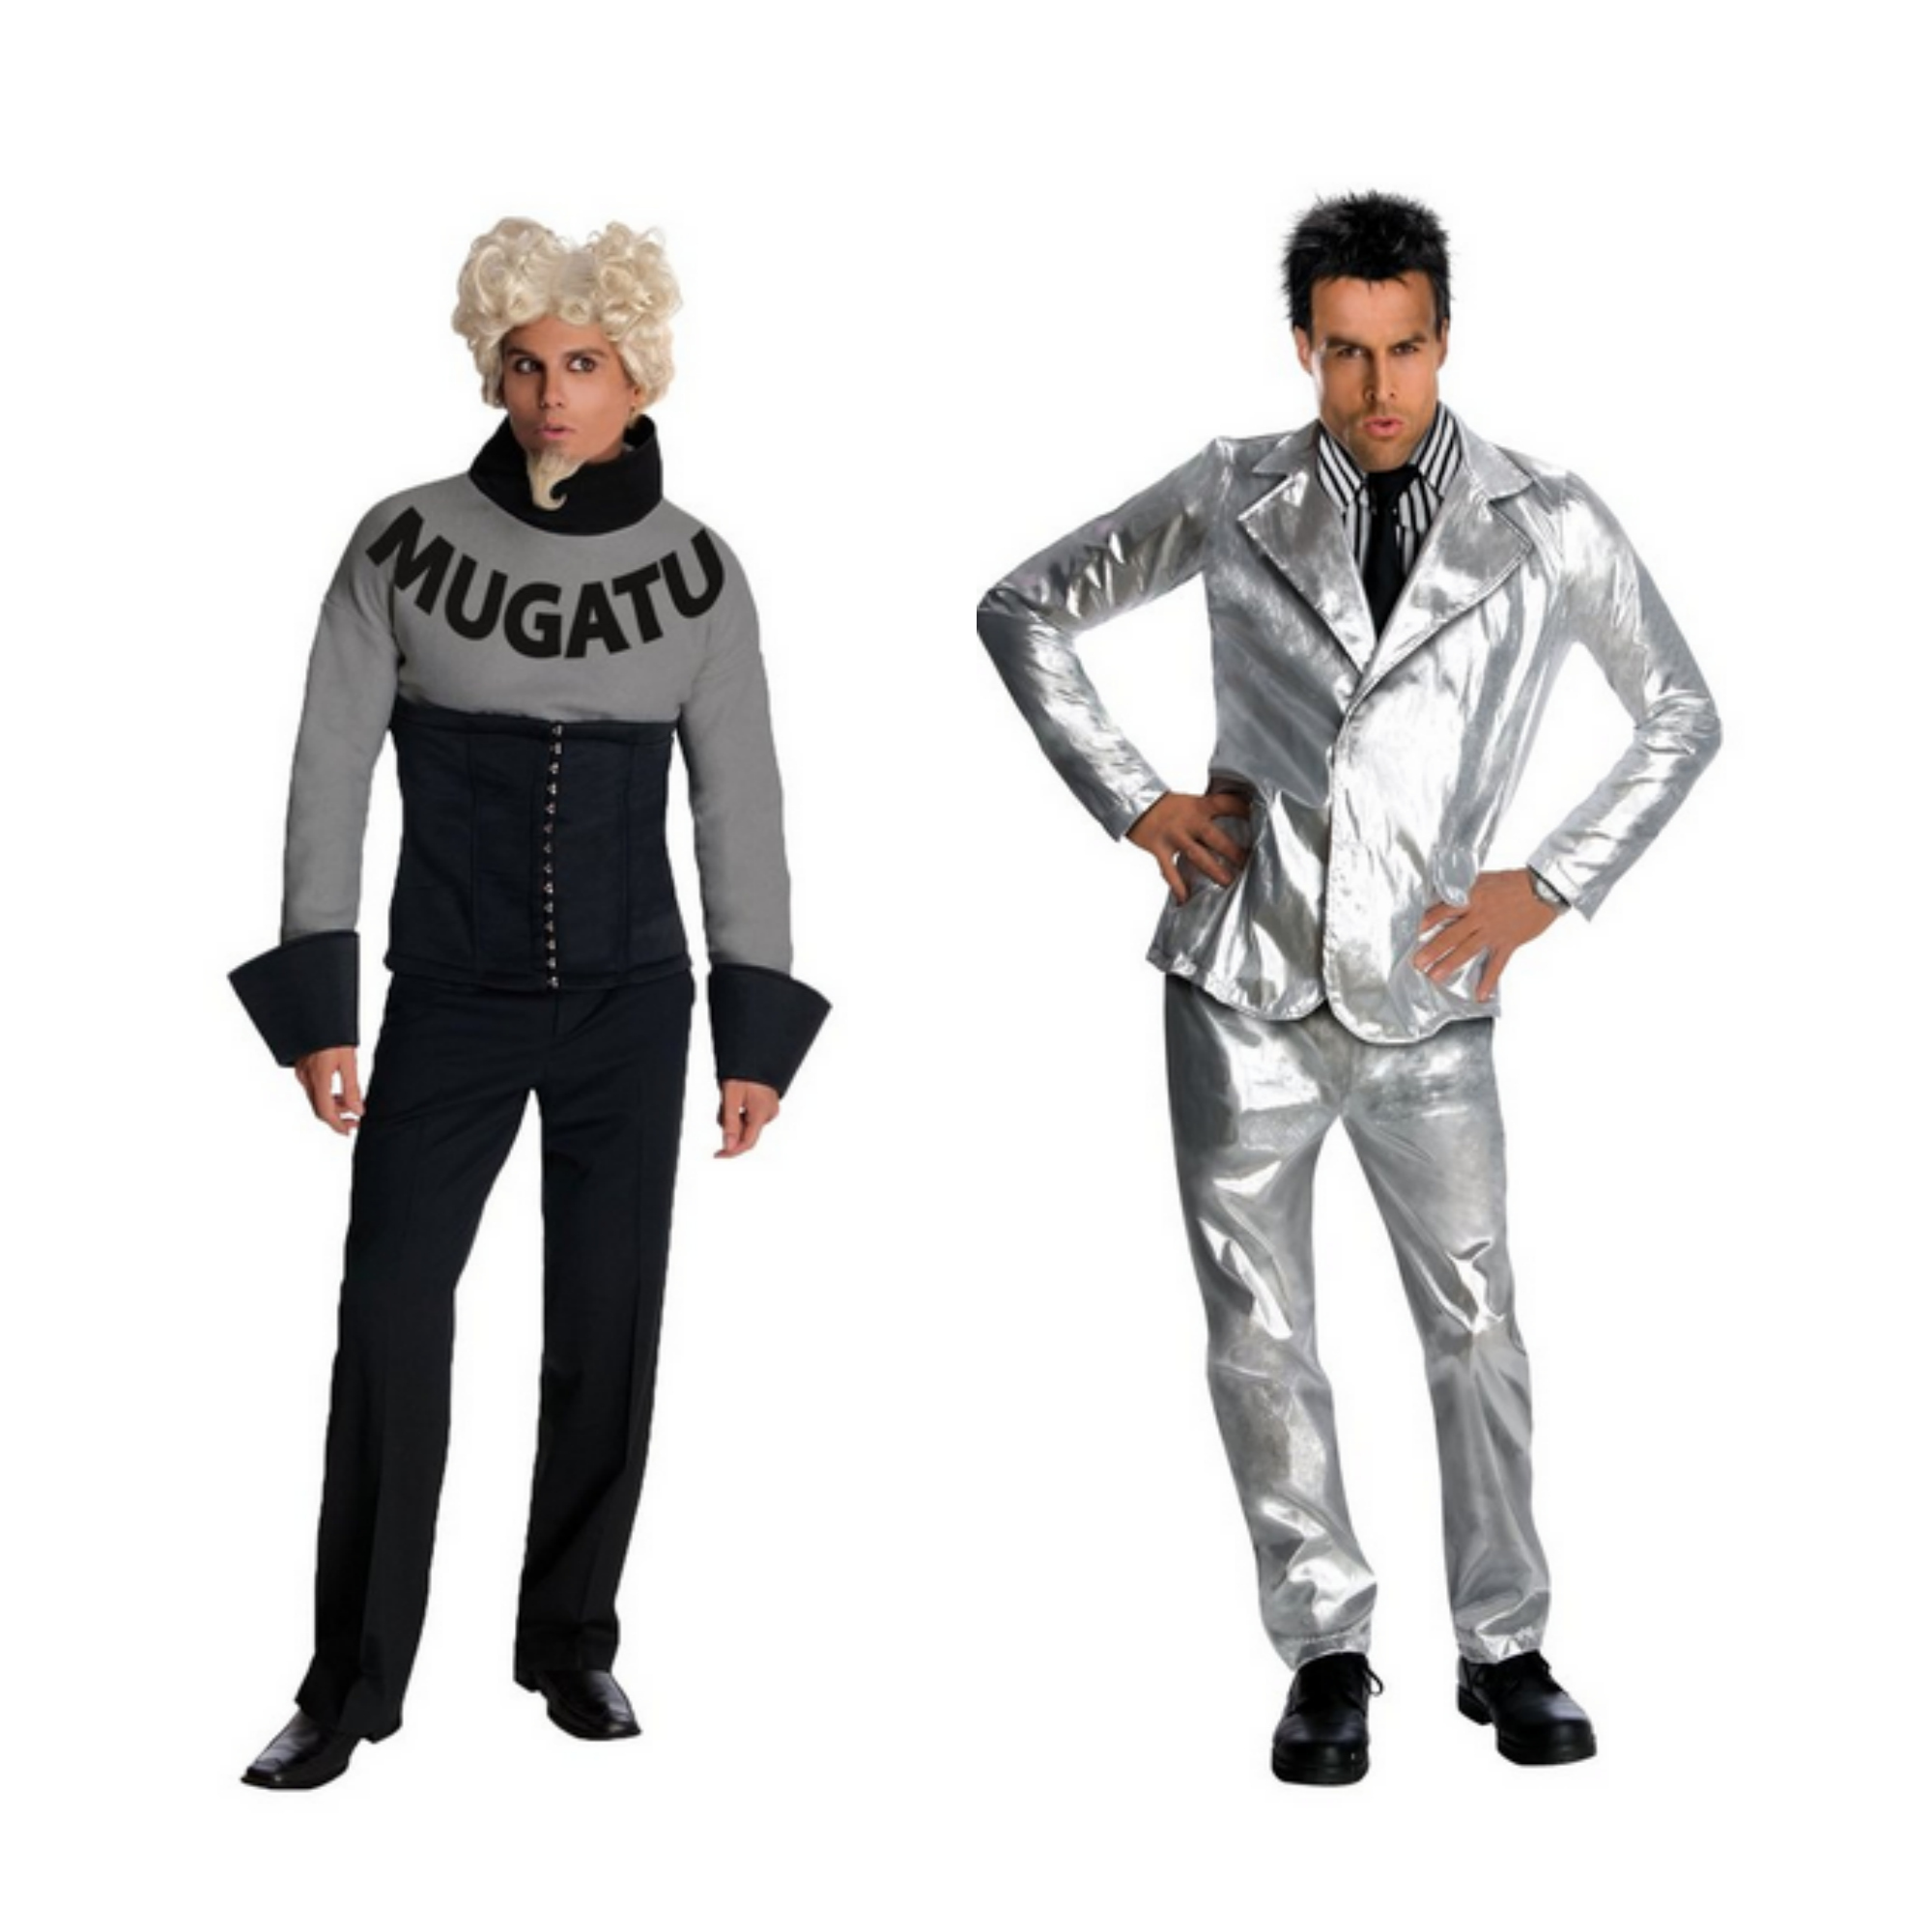 Derek Zoolander and Mugatu costume Halloween